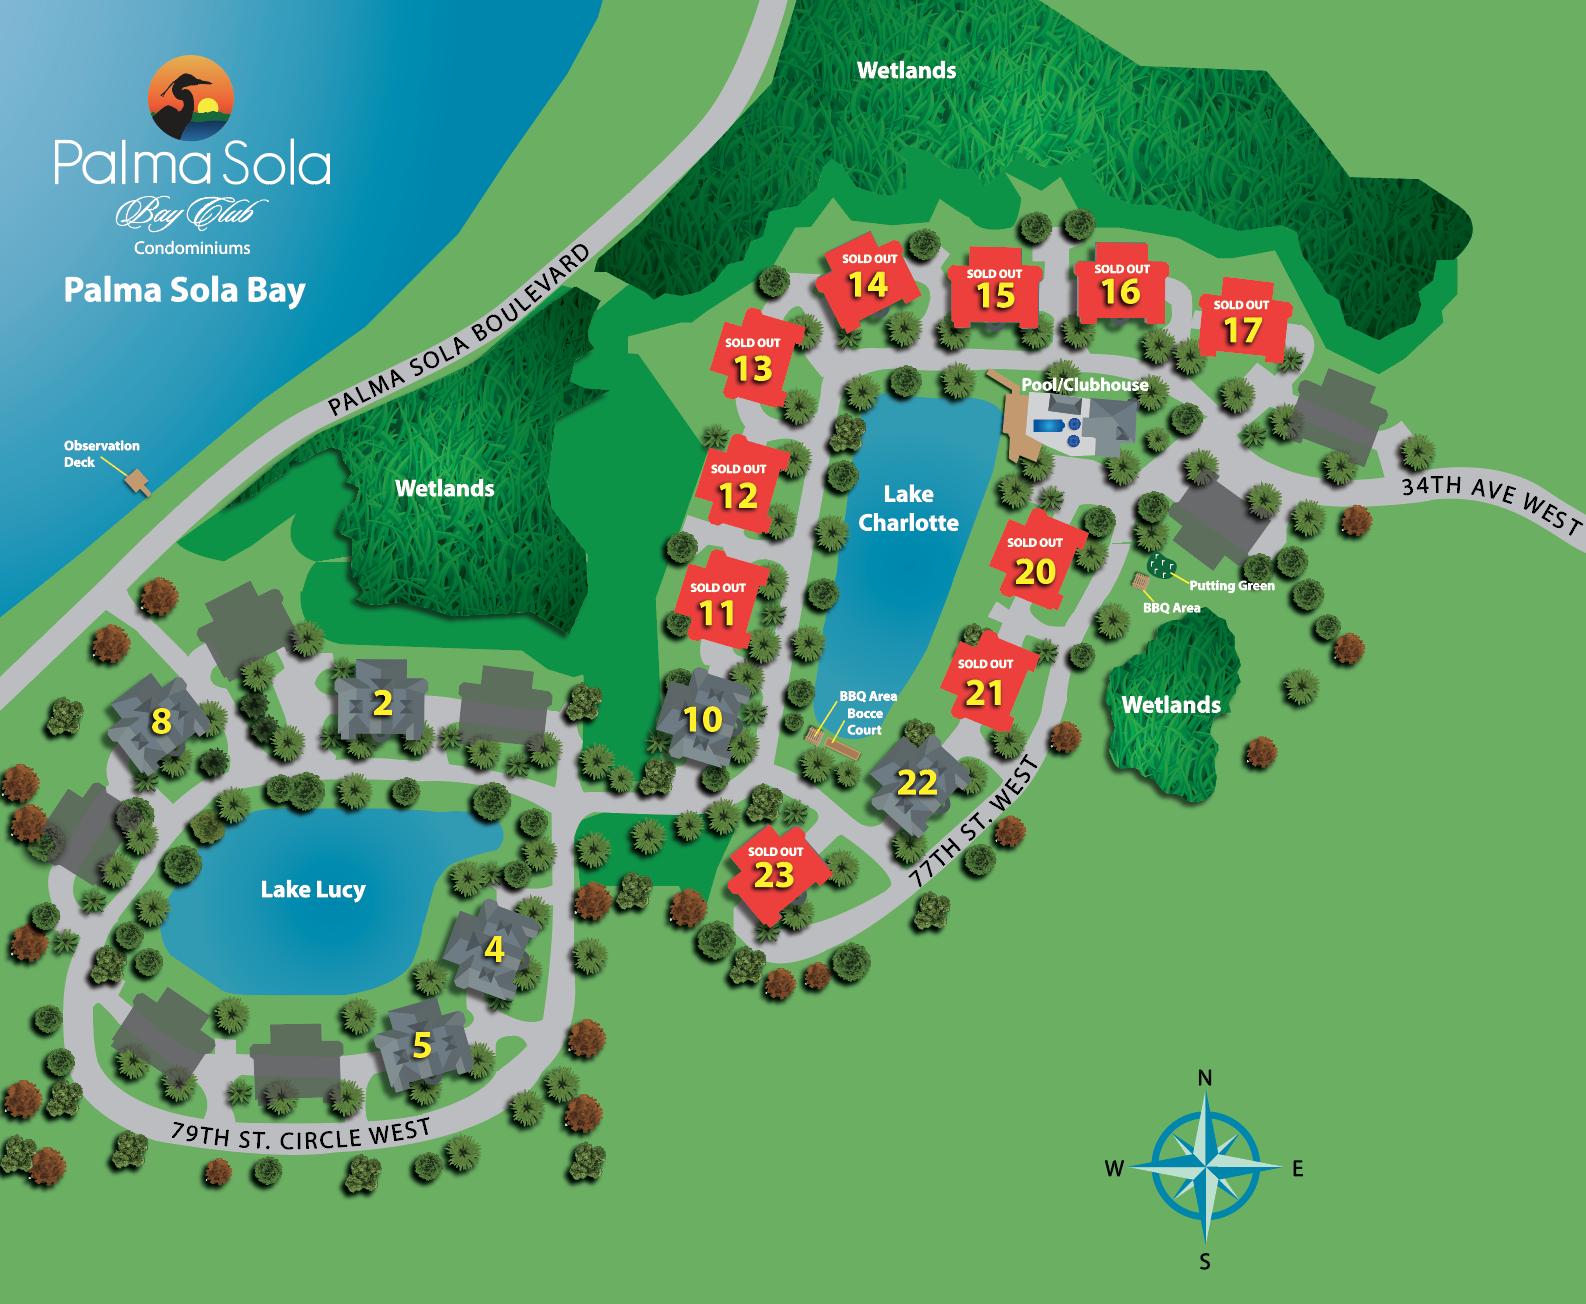 Palma Sola Bay Club Site Plan Bradenton